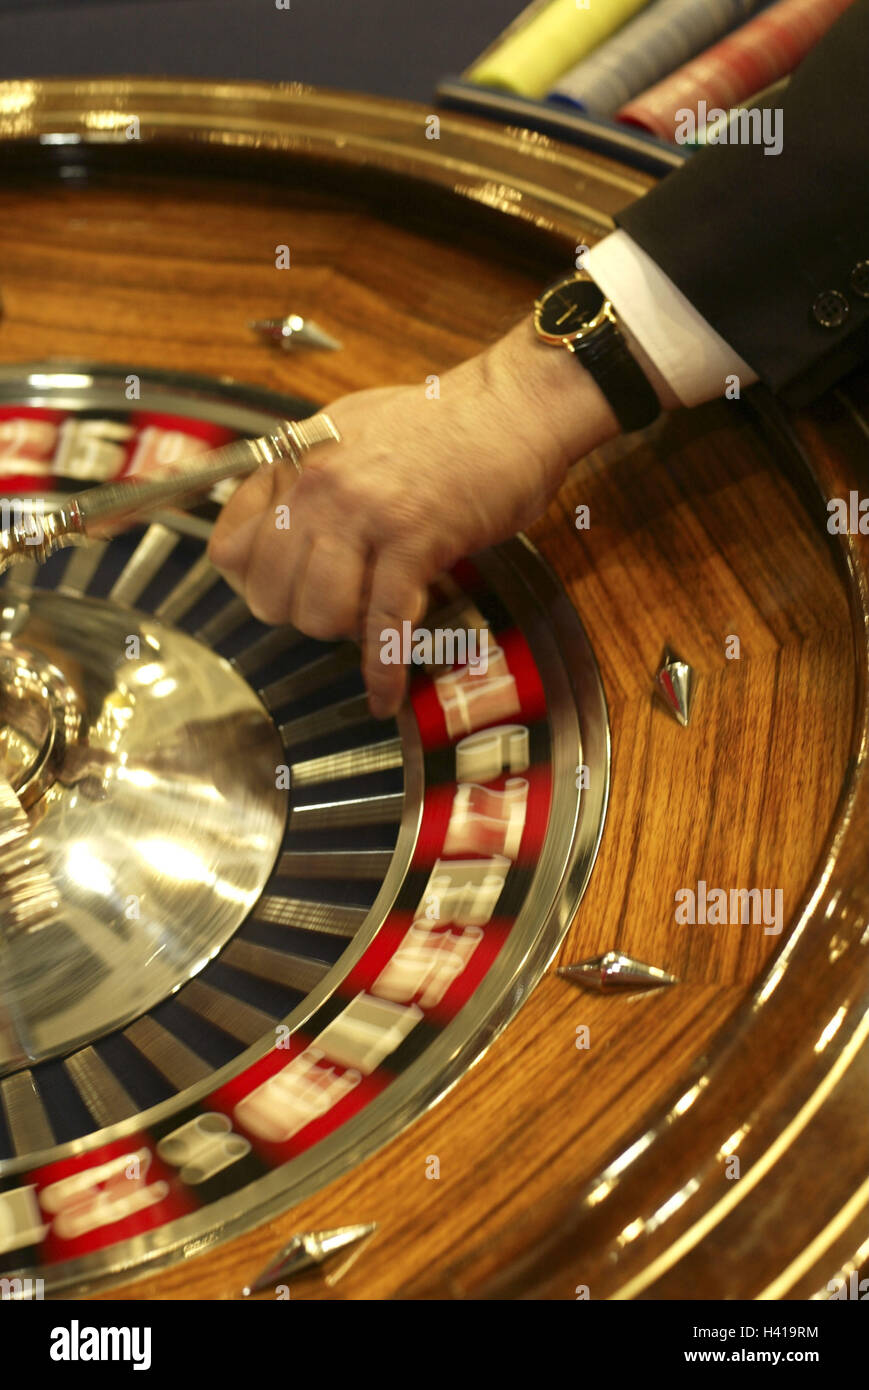 Casino, roulette, croupier, detail, hand, blur casino, game chance, game, risk, chance, roulette game, roulette, - Stock Image